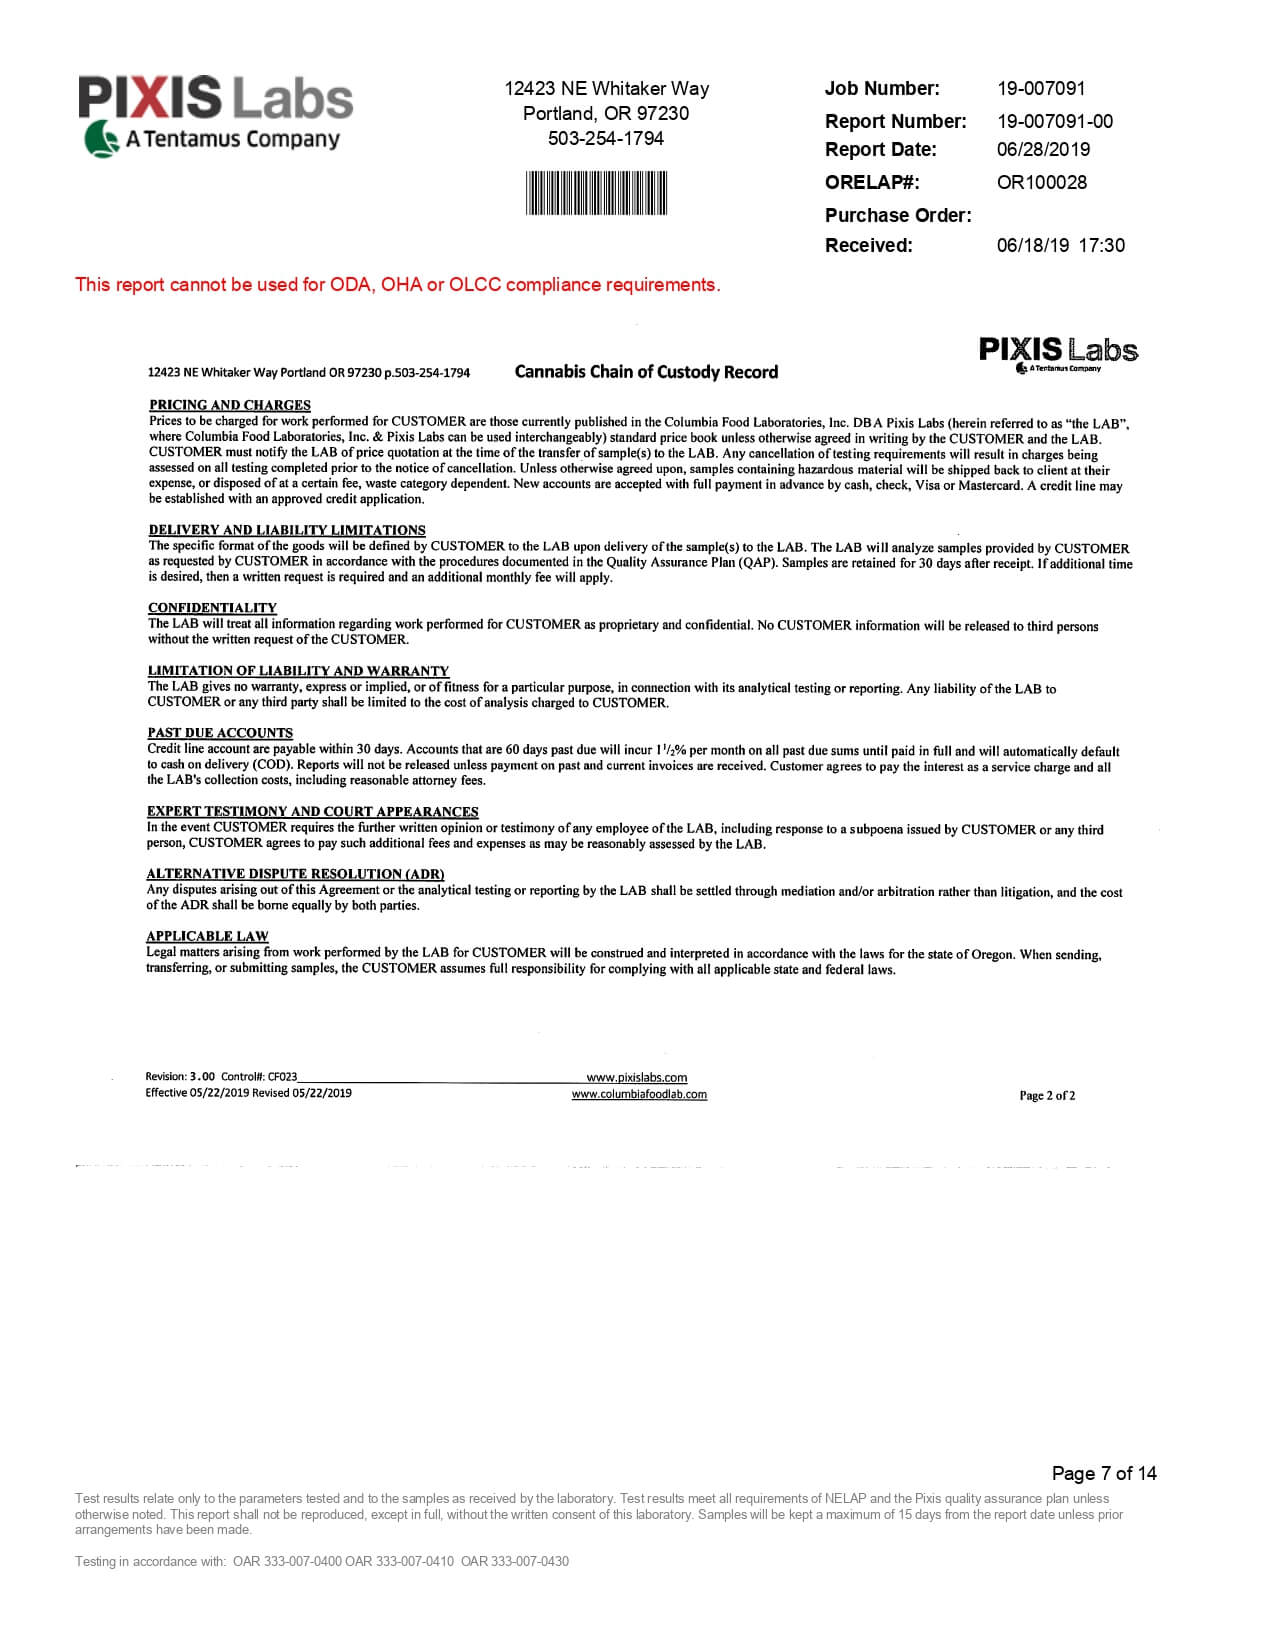 Select CBD Capsule Recover Soft Gel 2 Pack 33.3mg Lab Report